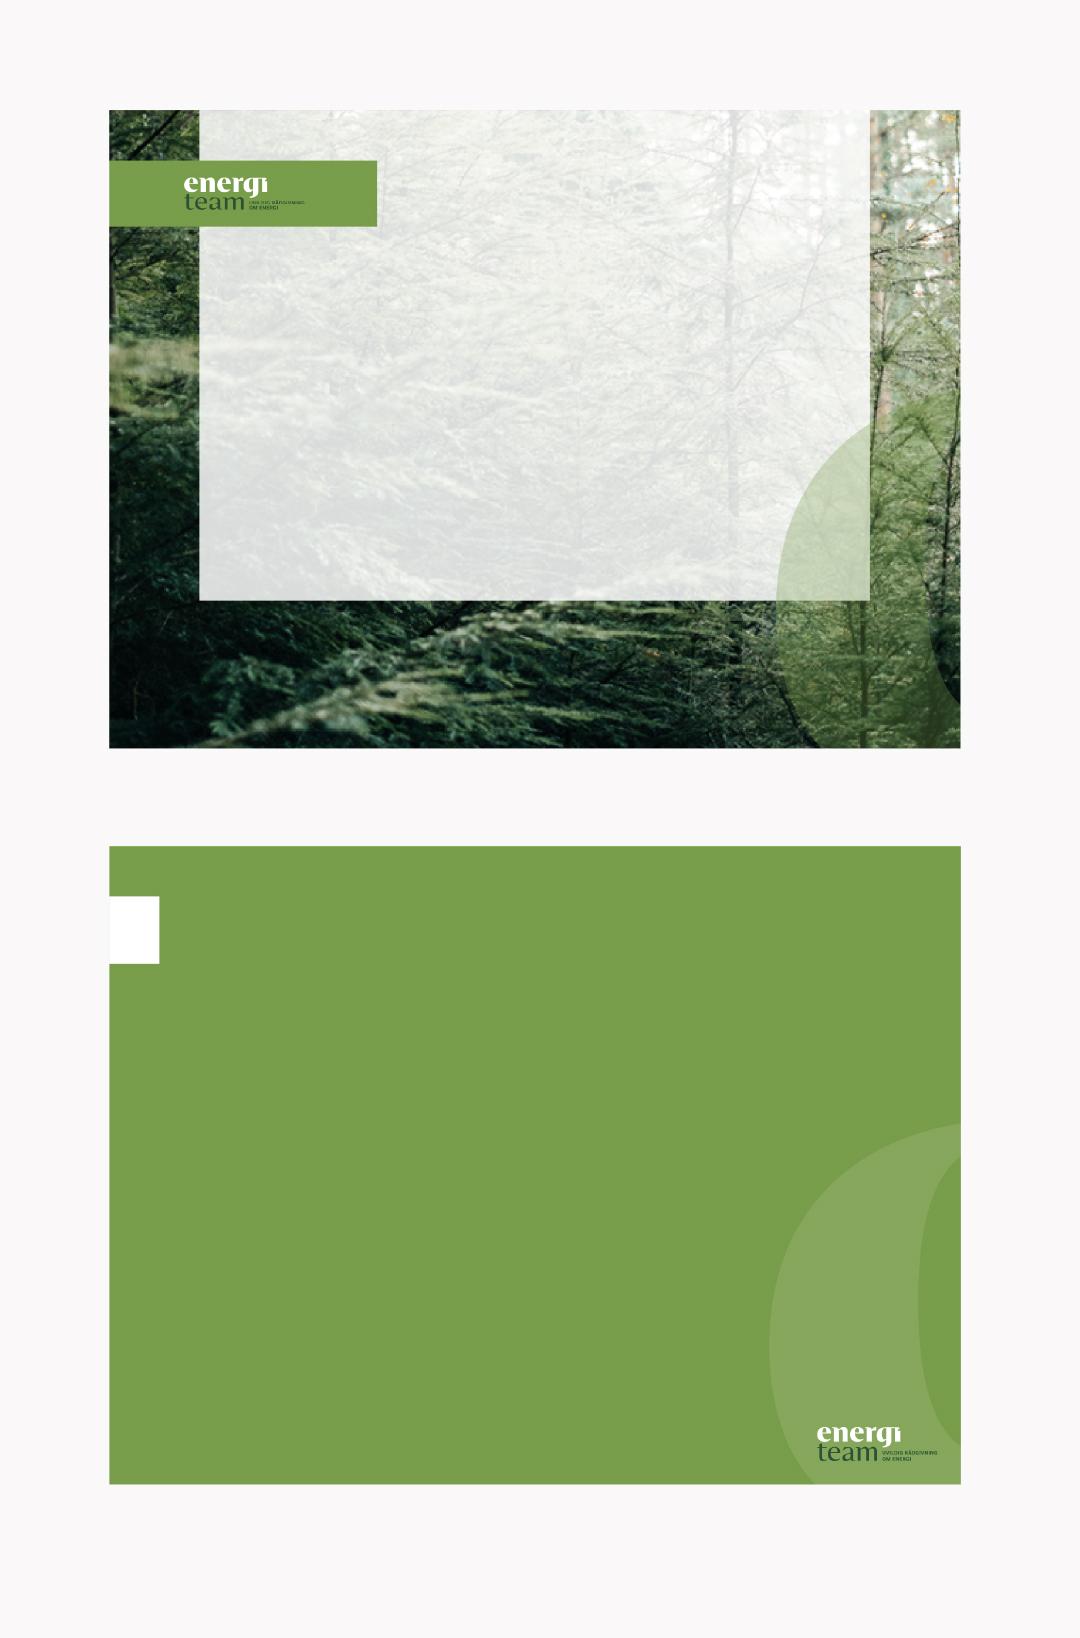 Slide til Energiteam